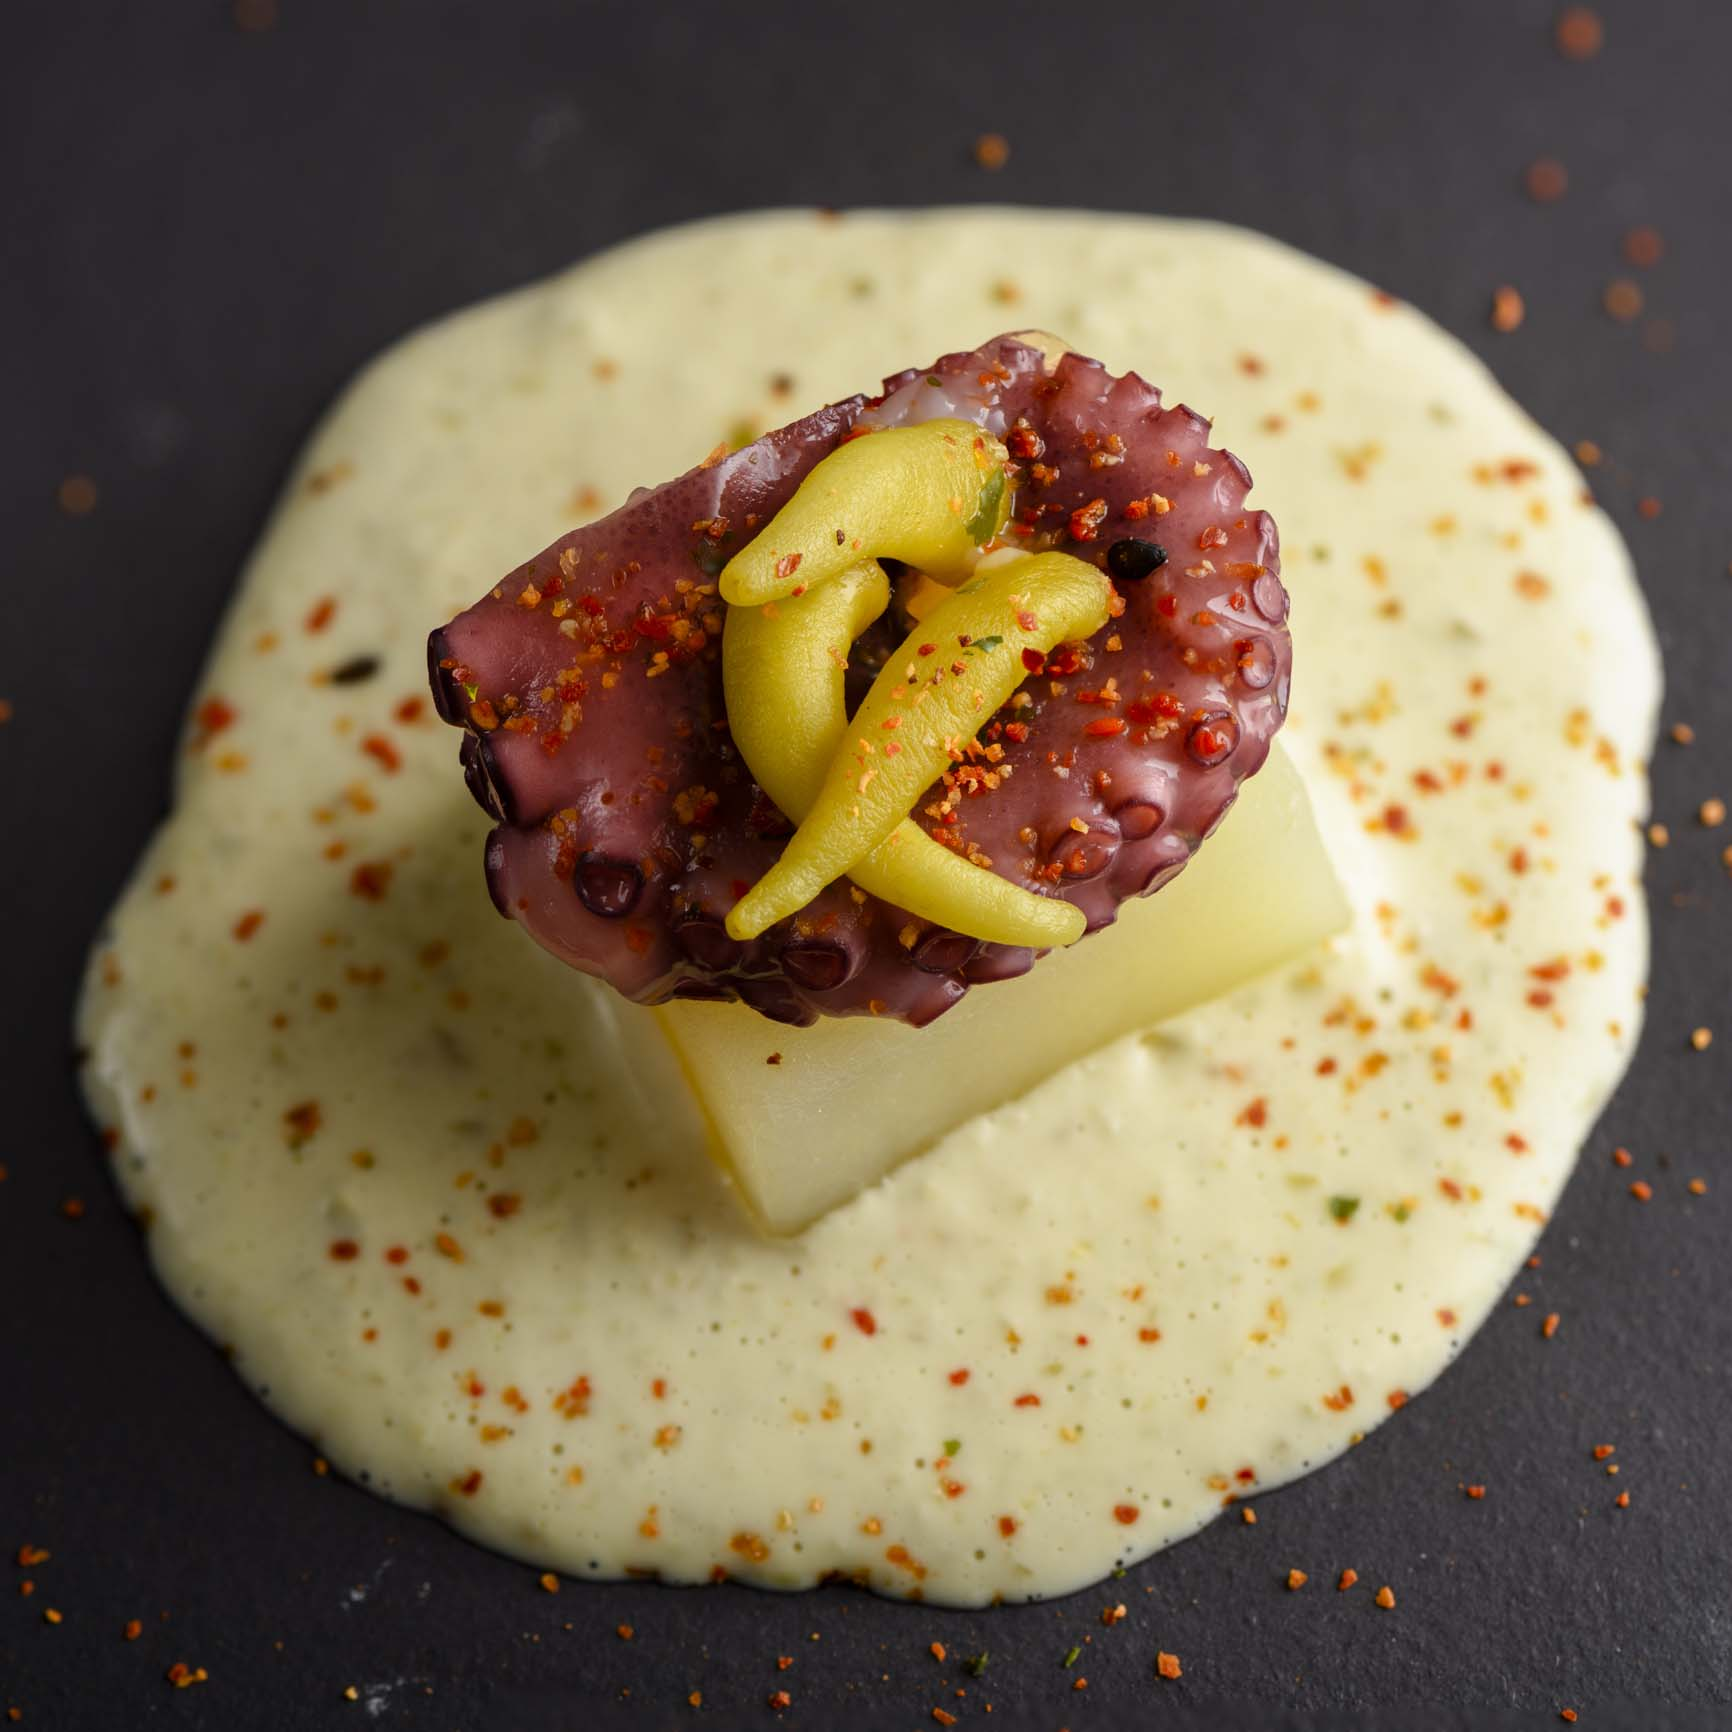 Pulpo con patata y salsa de guindilla maridado con Txakolí tradicional D.O. Arabako Txakolina